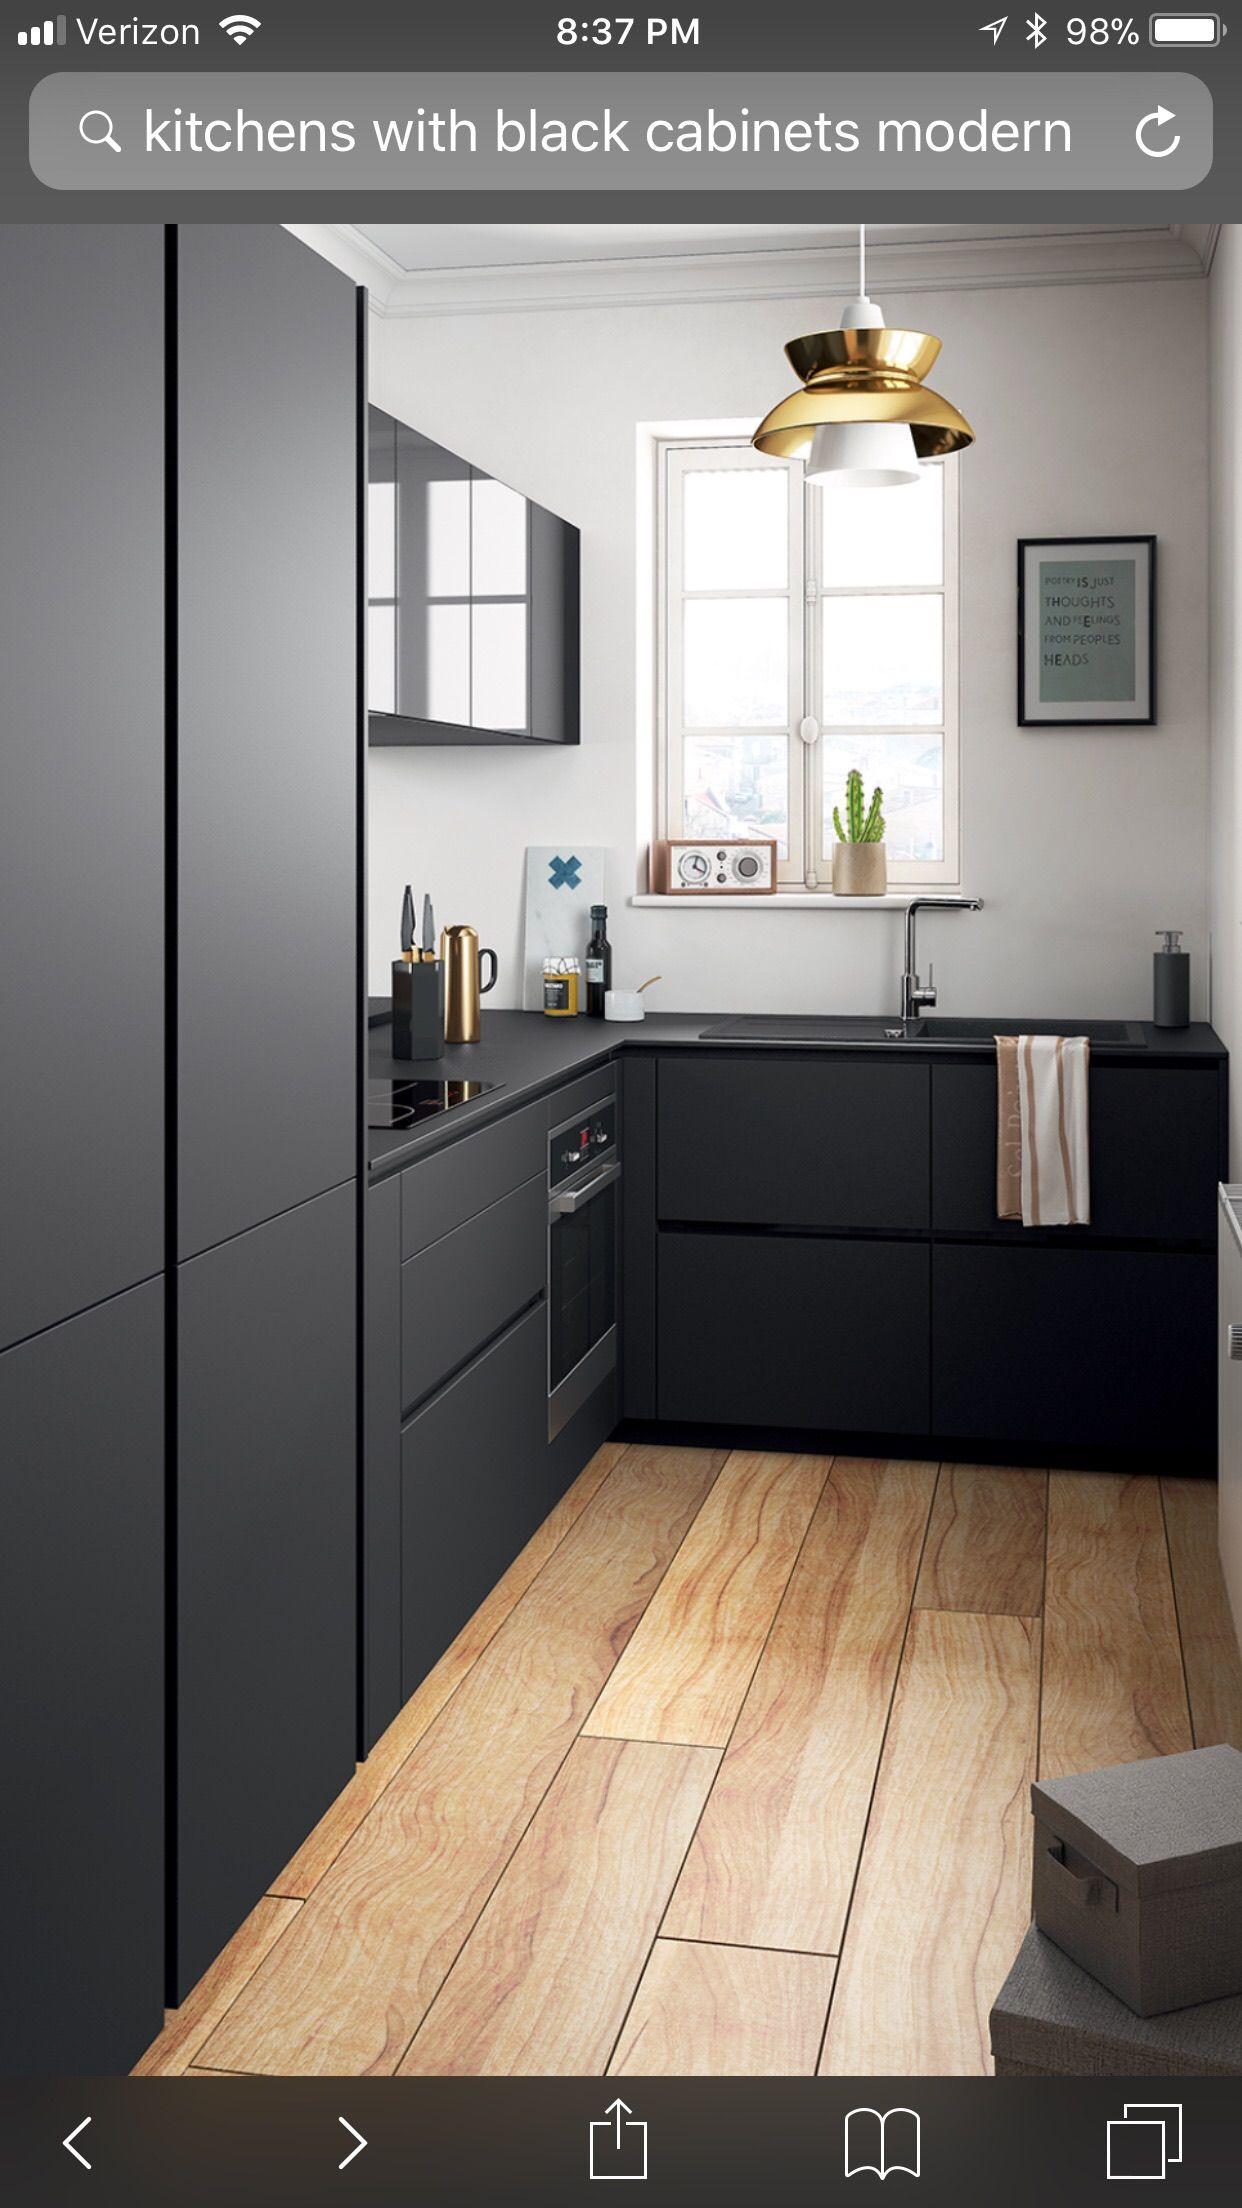 Pin By A Hfs On Kitchen Ideas Modern Black Kitchen Small Modern Kitchens Kitchen Remodel Small